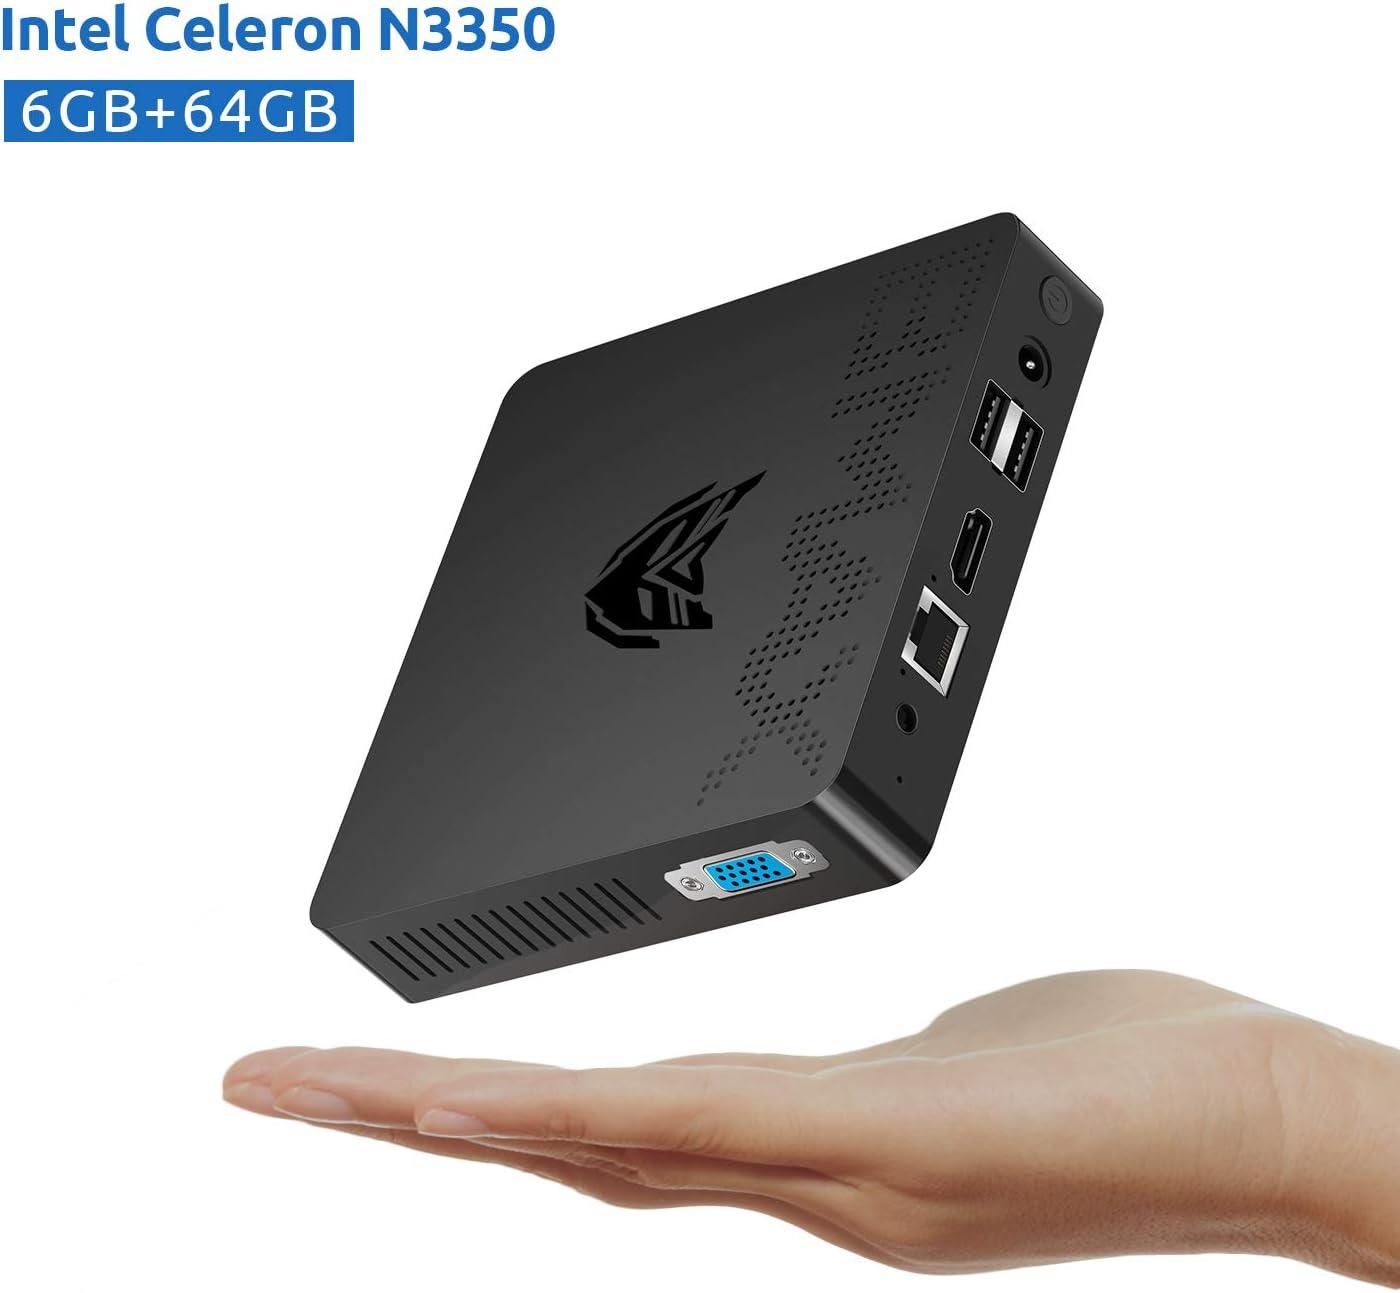 Mini PC, Fanless Intel Celeron N3350 Processor (Up to 2.4GHz) 6GB DDR4/ 64GB eMMC Windows 10 Pro Mini Desktop Computer 2.4G/5G Dual WiFi, HDMI+VGA 4K Dual-Screen Display, BT4.2, USB x4